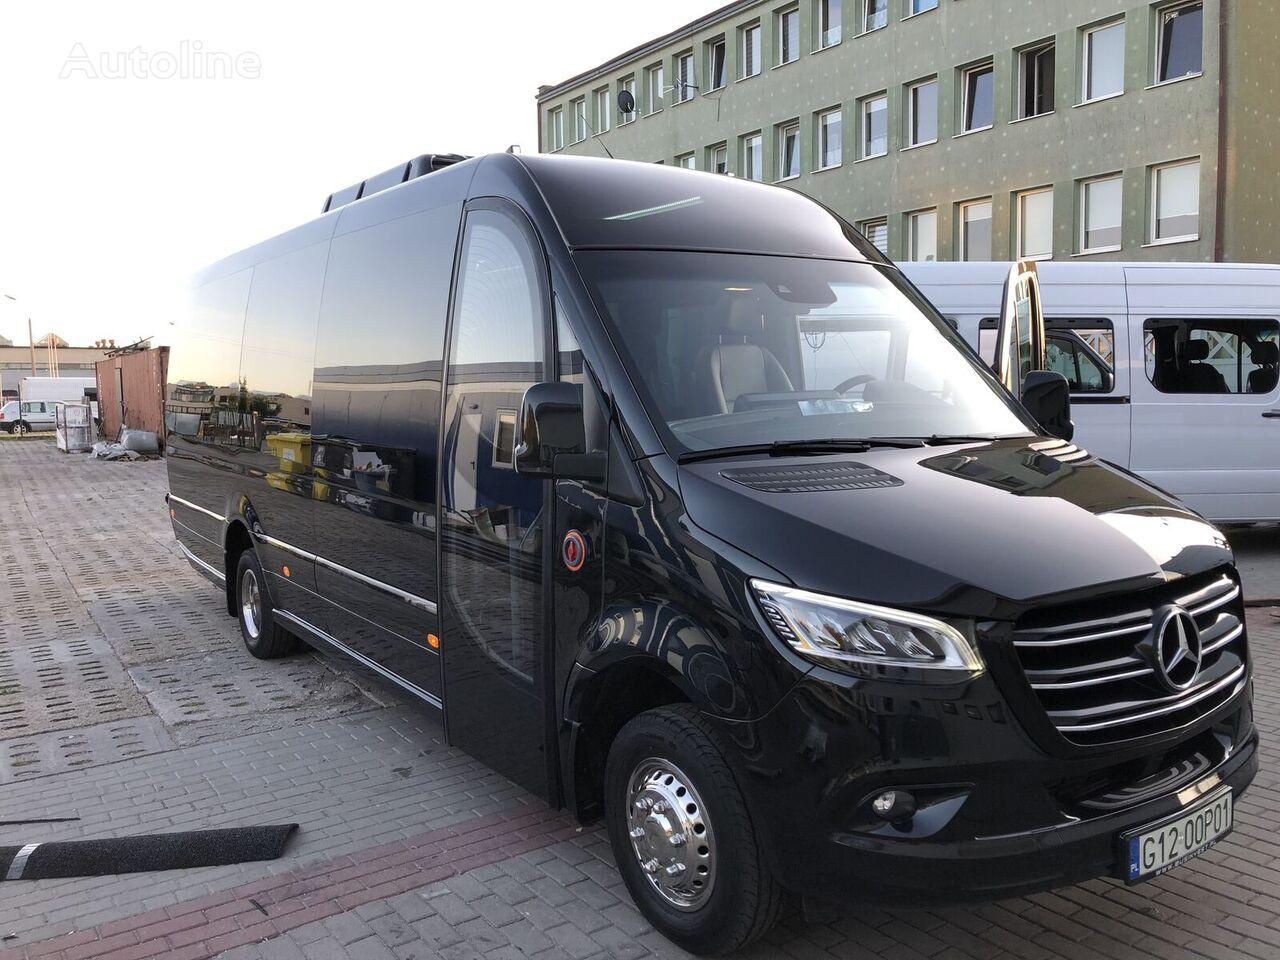 nowy bus pasażerski MERCEDES-BENZ Sprinter 516 CDI  SOLD !!!!!!!!